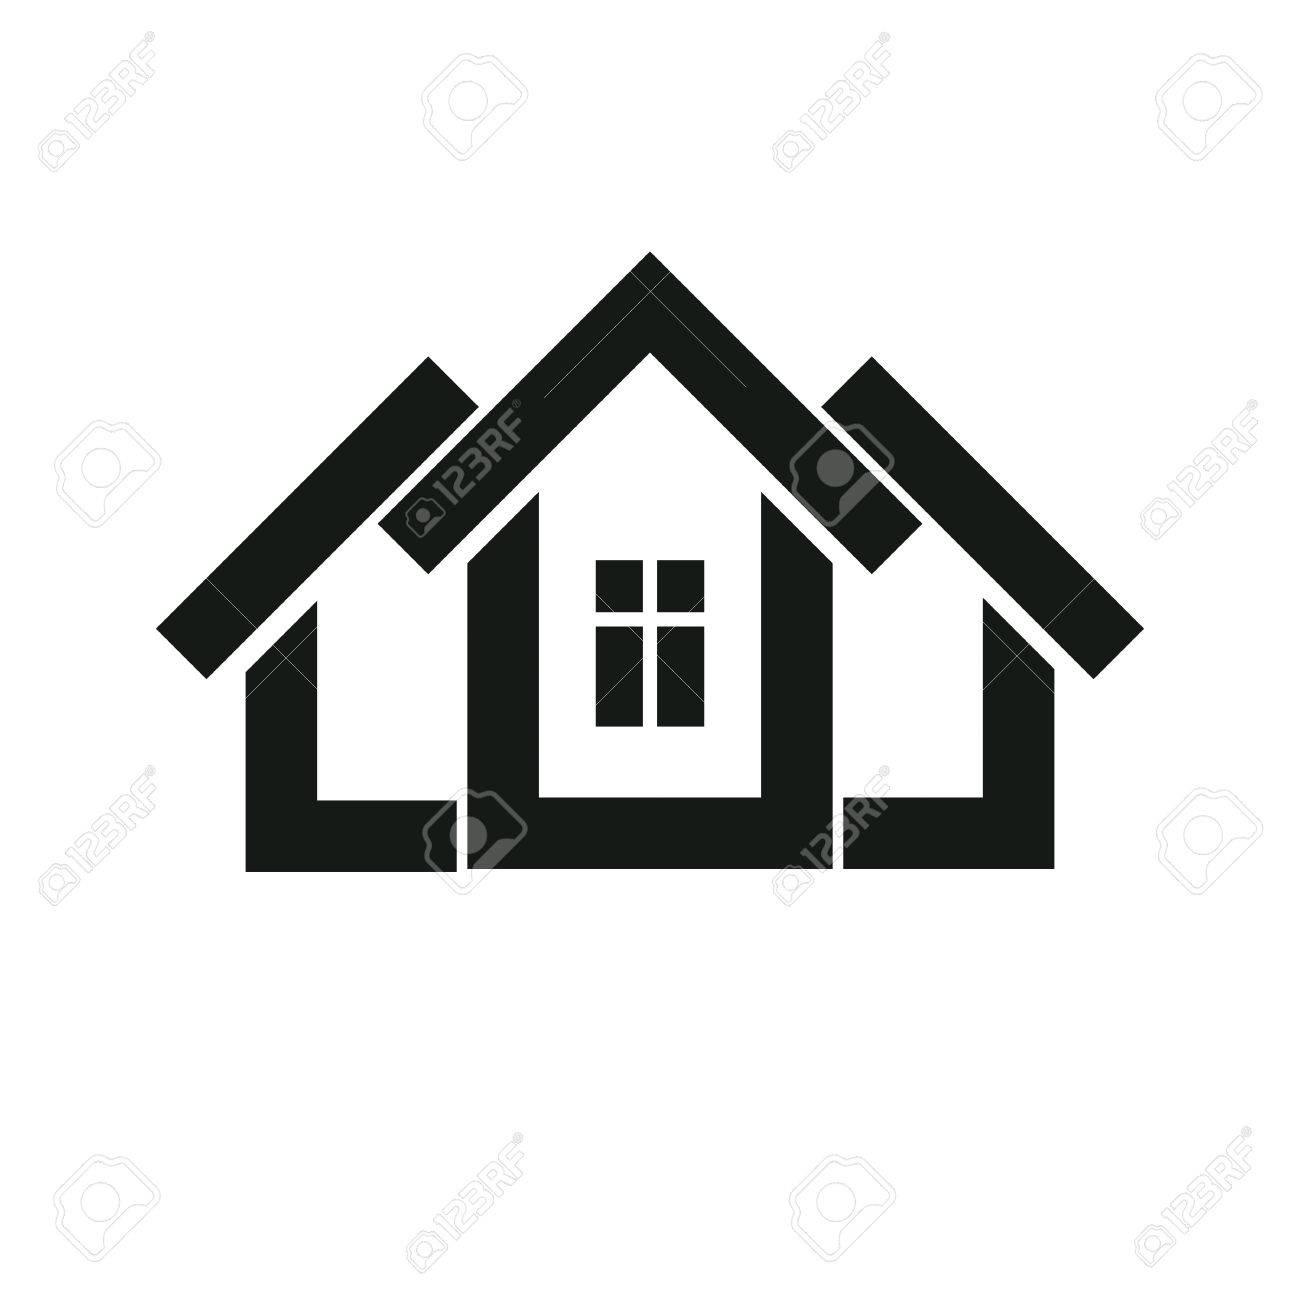 Bauträger Stilvolle Symbol, Immobilienbüro Firmenlogo. Kreative Bau ...